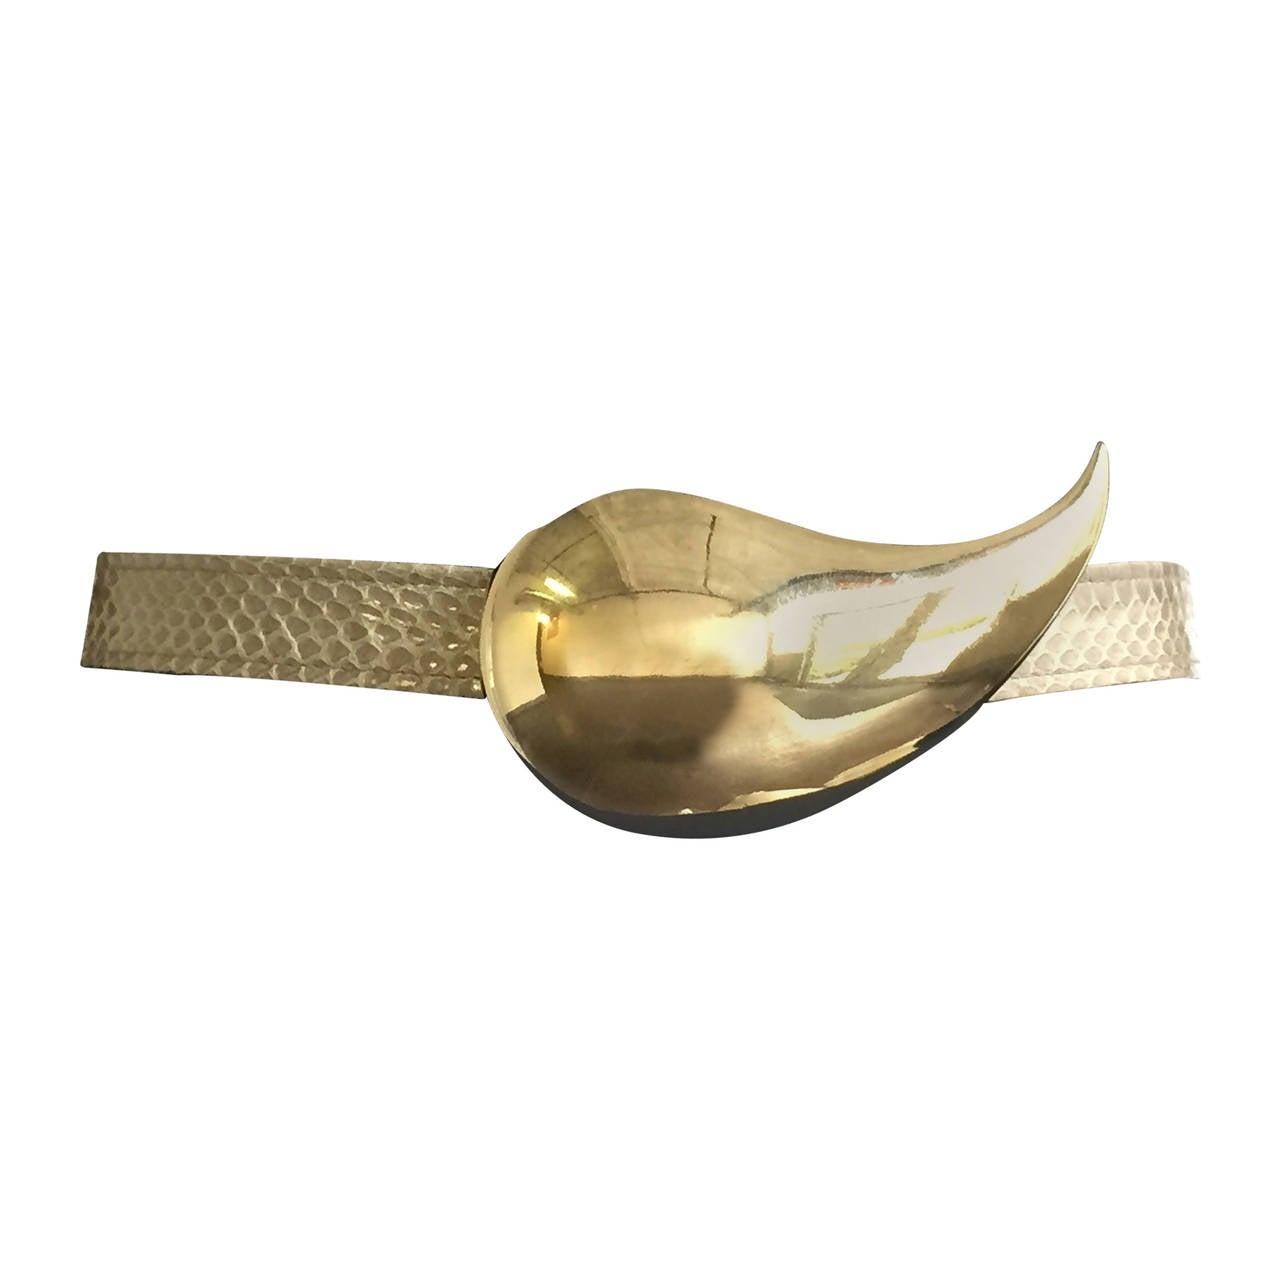 Alexis Kirk 1980s Brass Tear Drop Adjustable Belt.